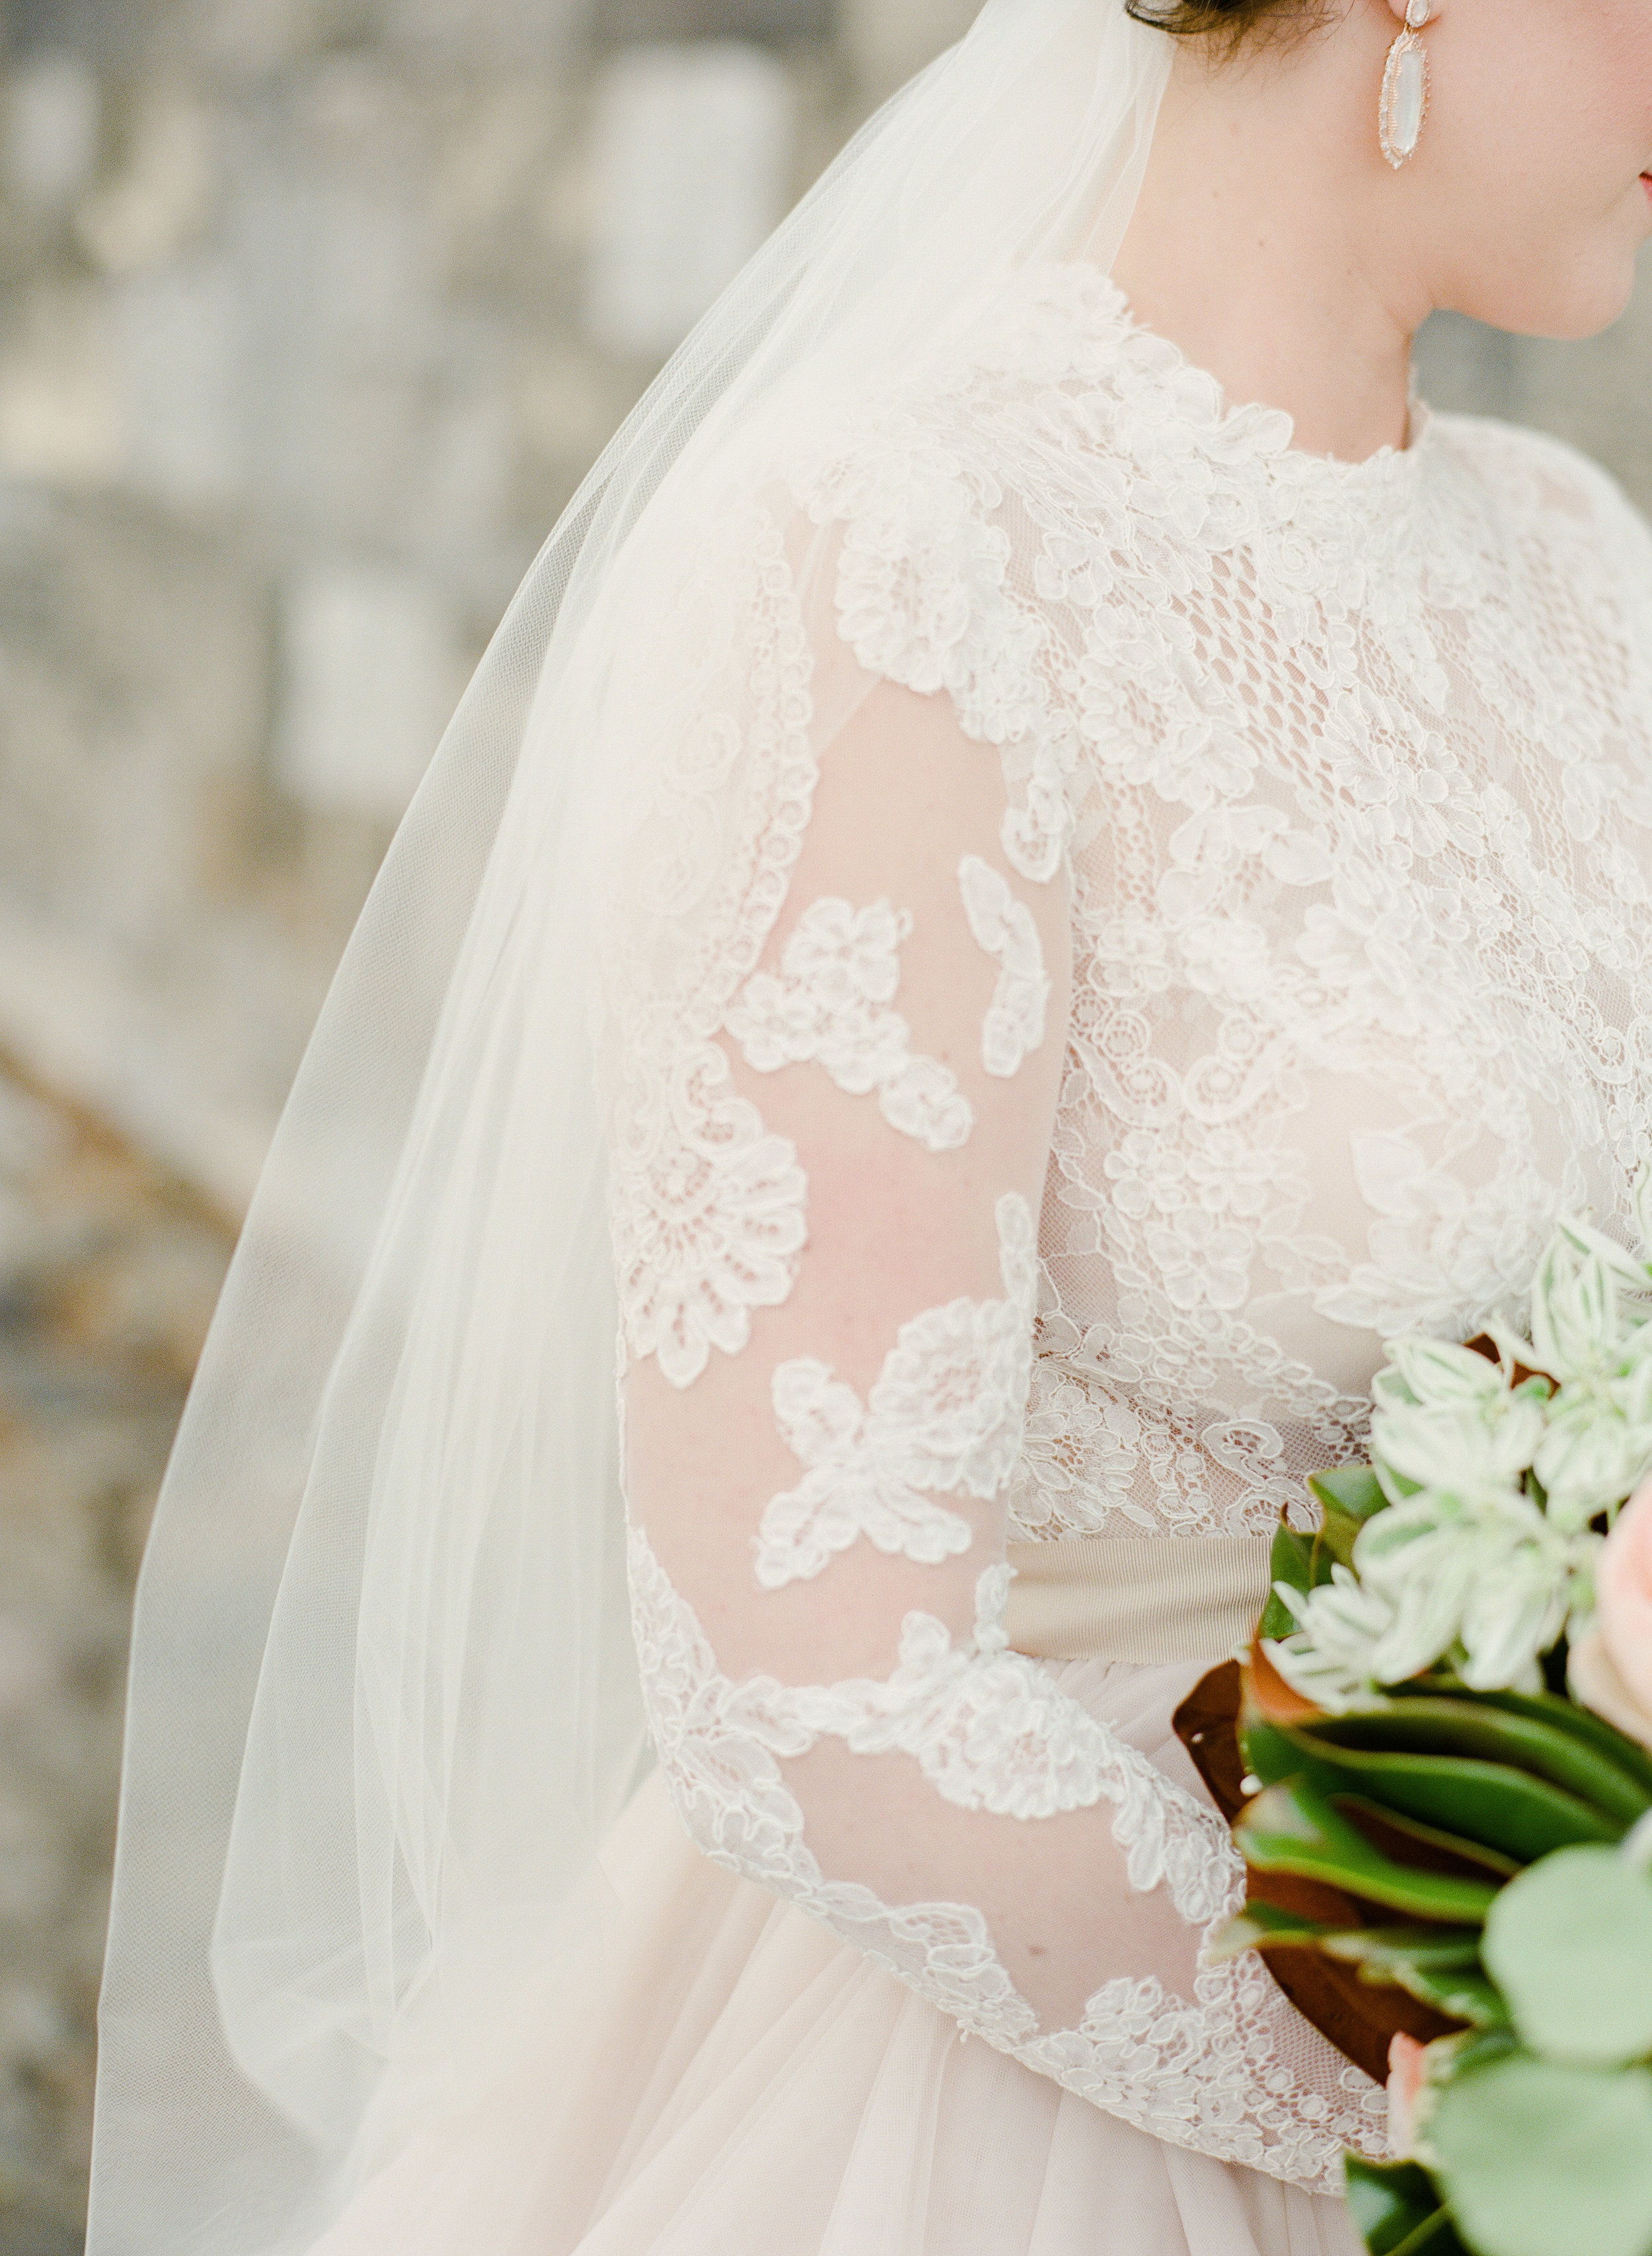 savannah-cha-bella-wedding-29.jpg